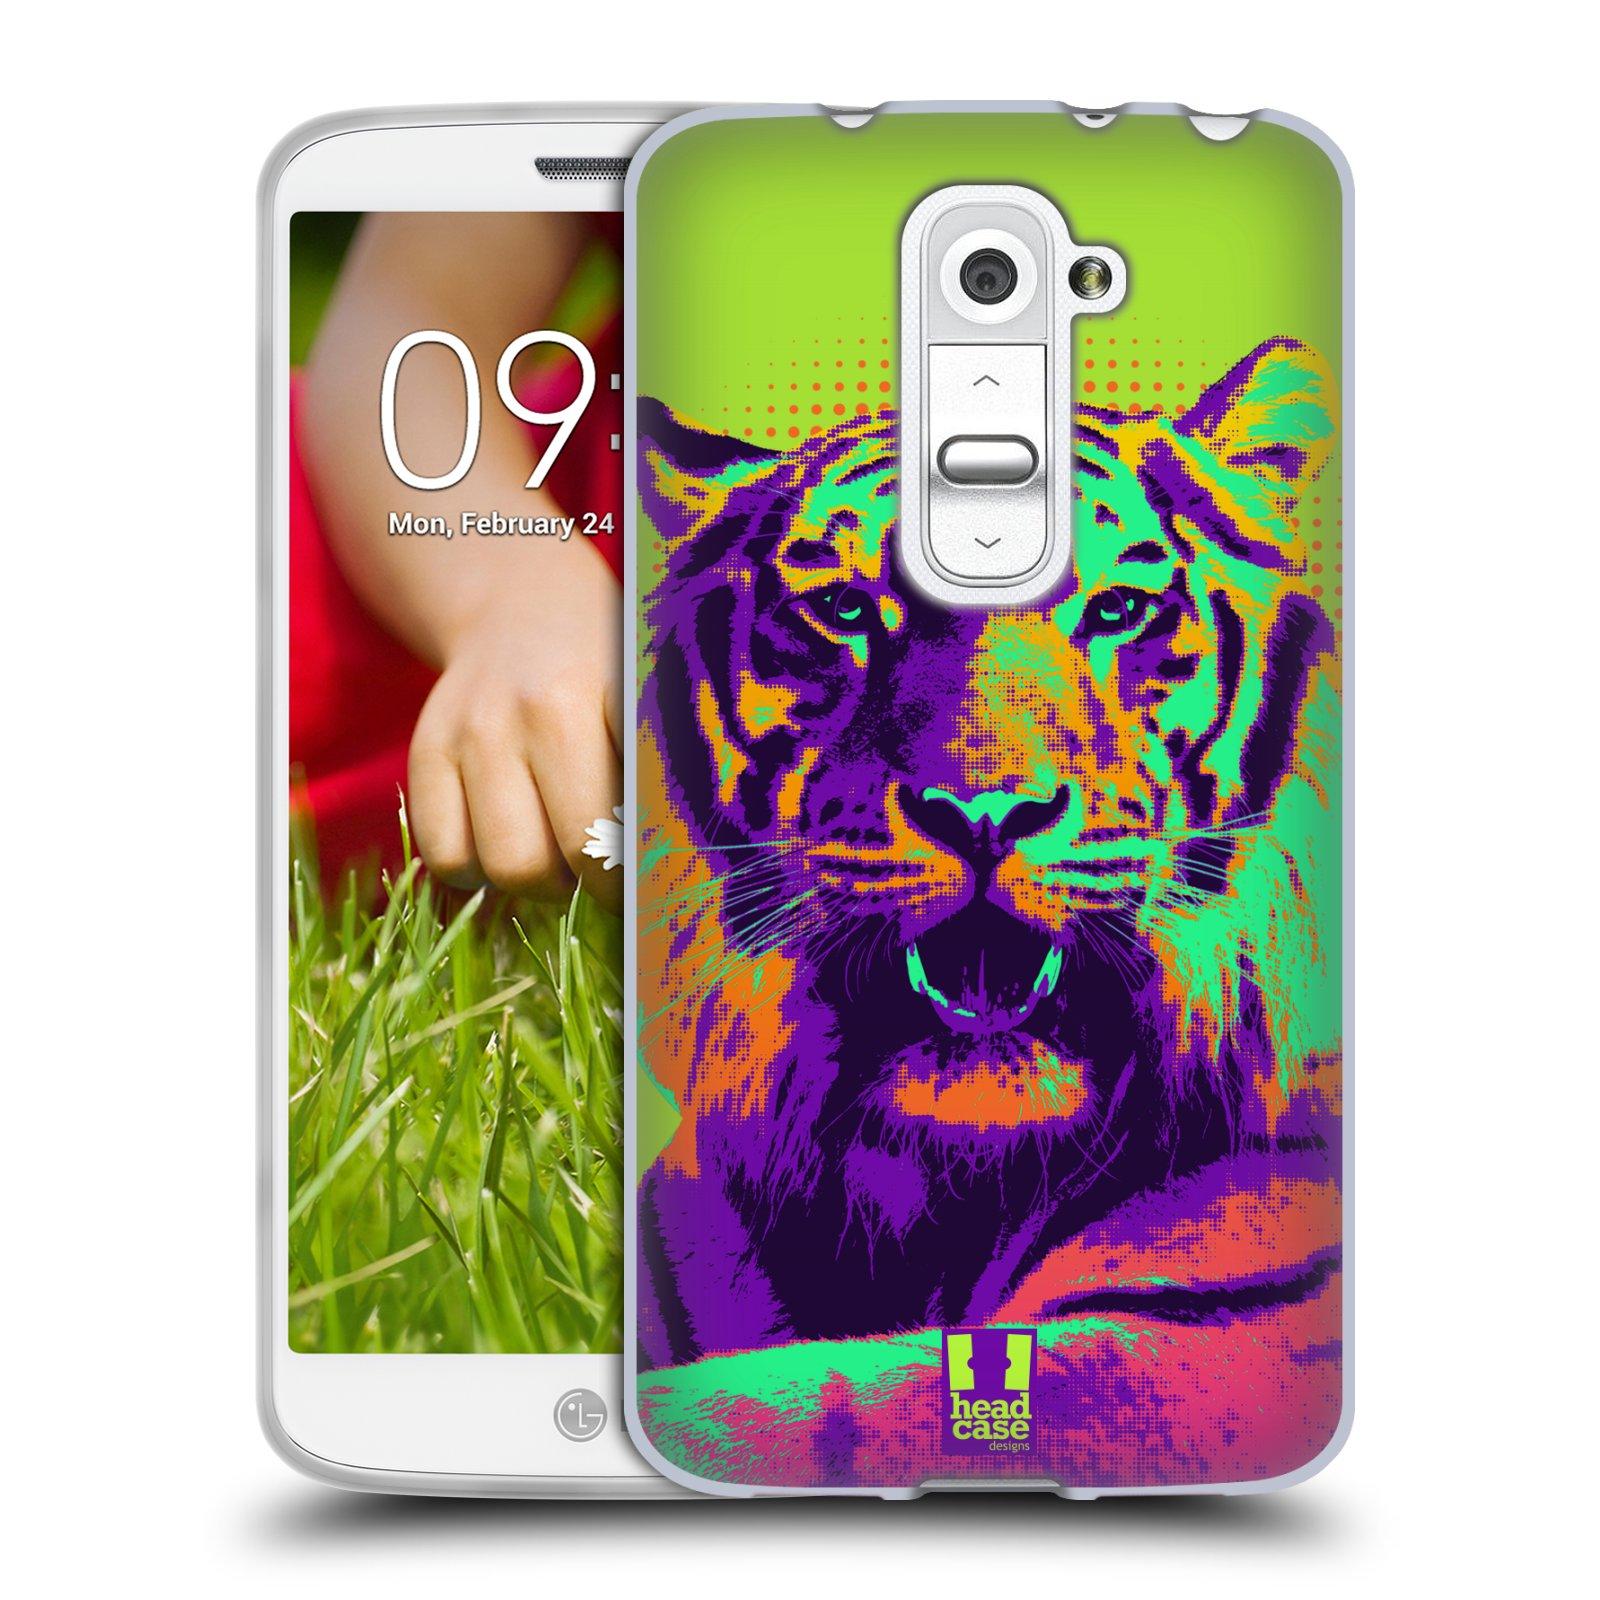 Silikonové pouzdro na mobil LG G2 Mini HEAD CASE POP PRINT TYGR (Silikonový kryt či obal na mobilní telefon LG G2 Mini D620)